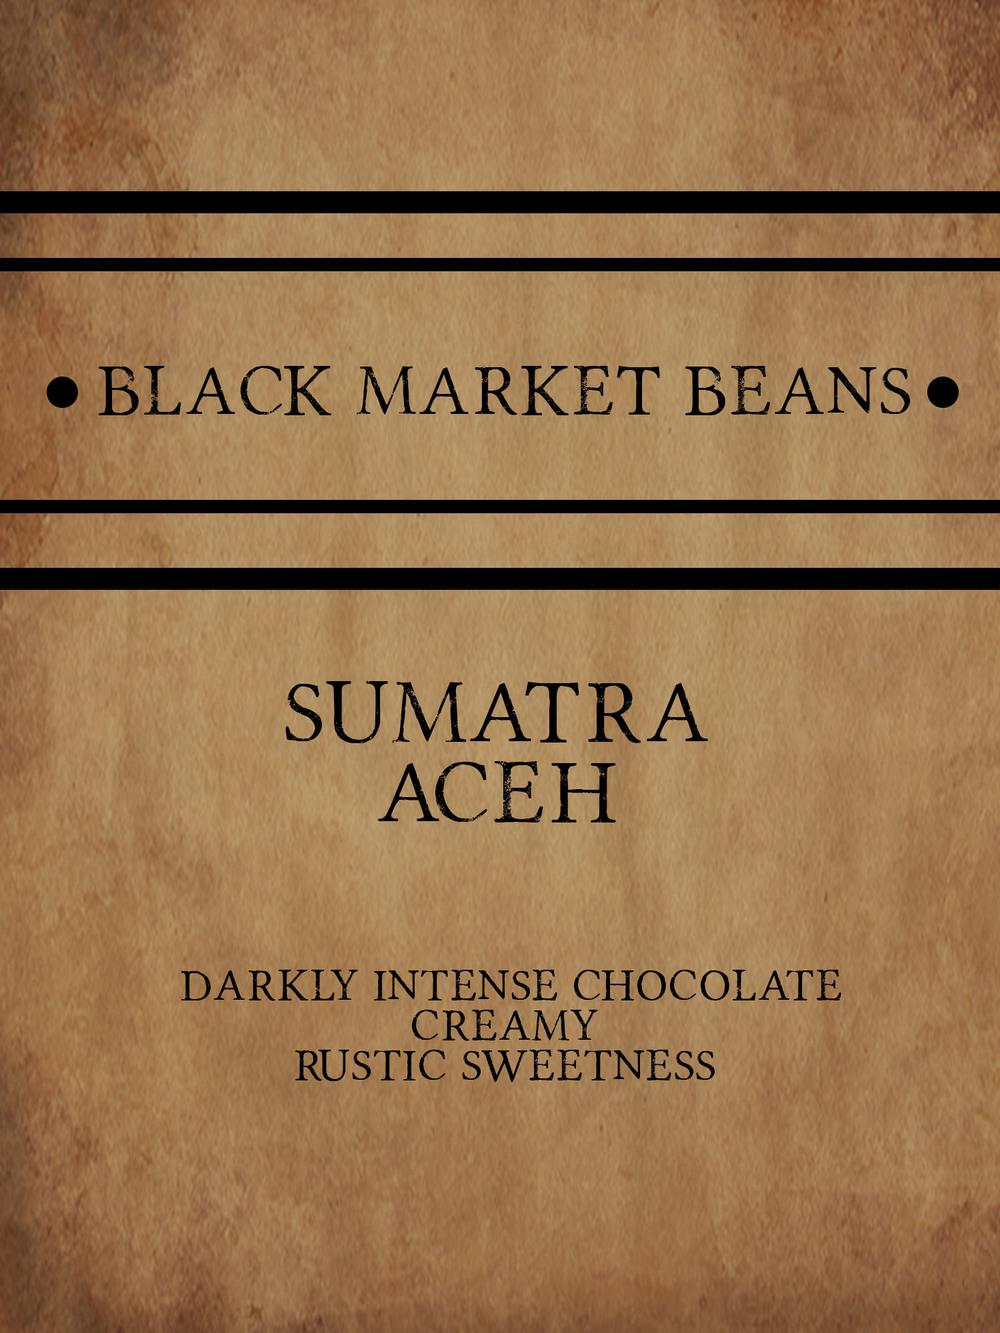 coffee_card_Sumatra_Aceh.jpg